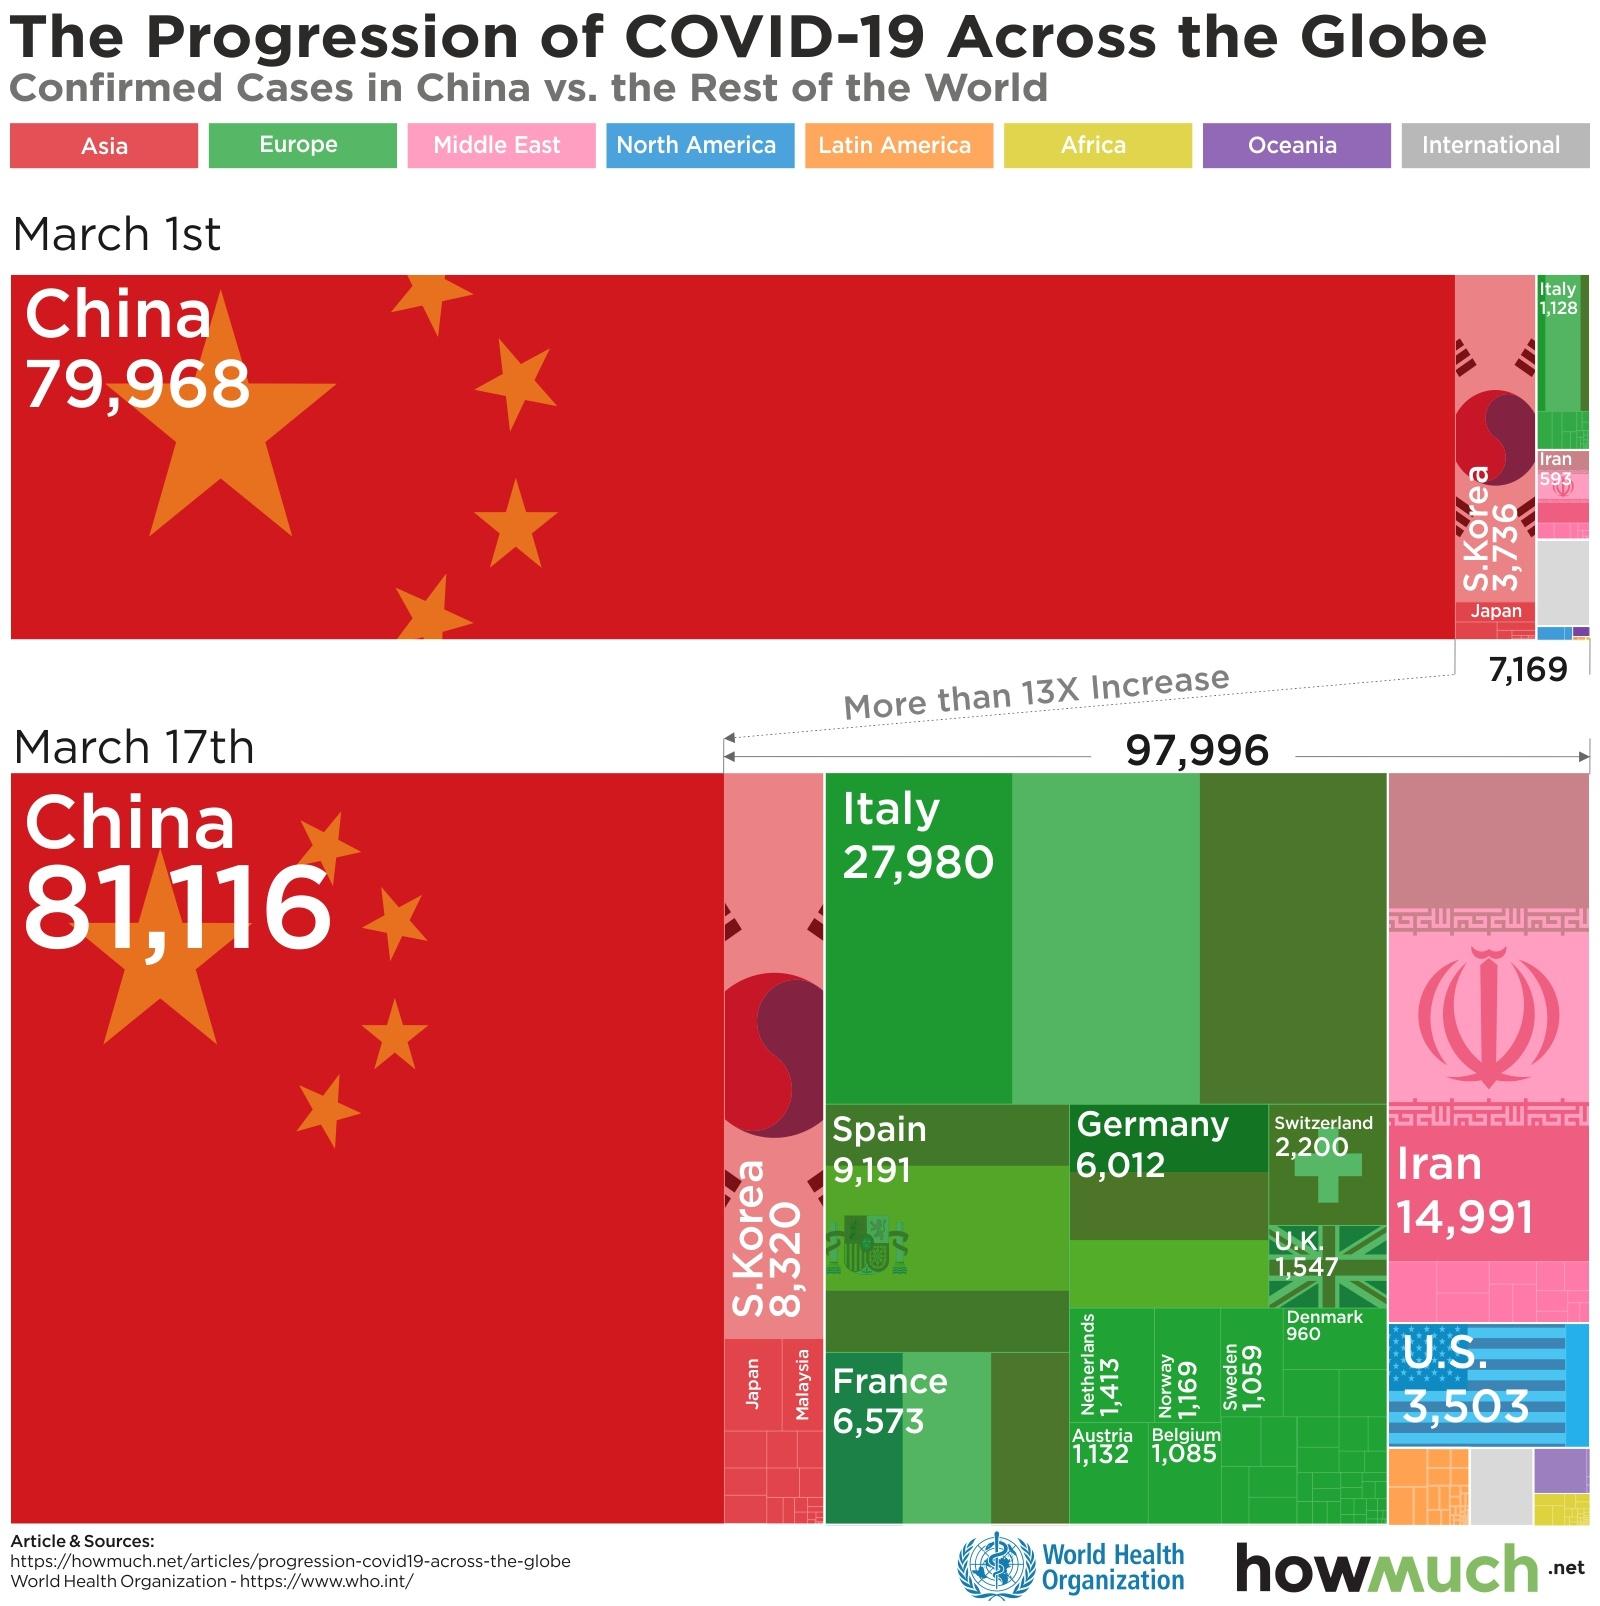 The Progression of COVID-19 Across the Globe